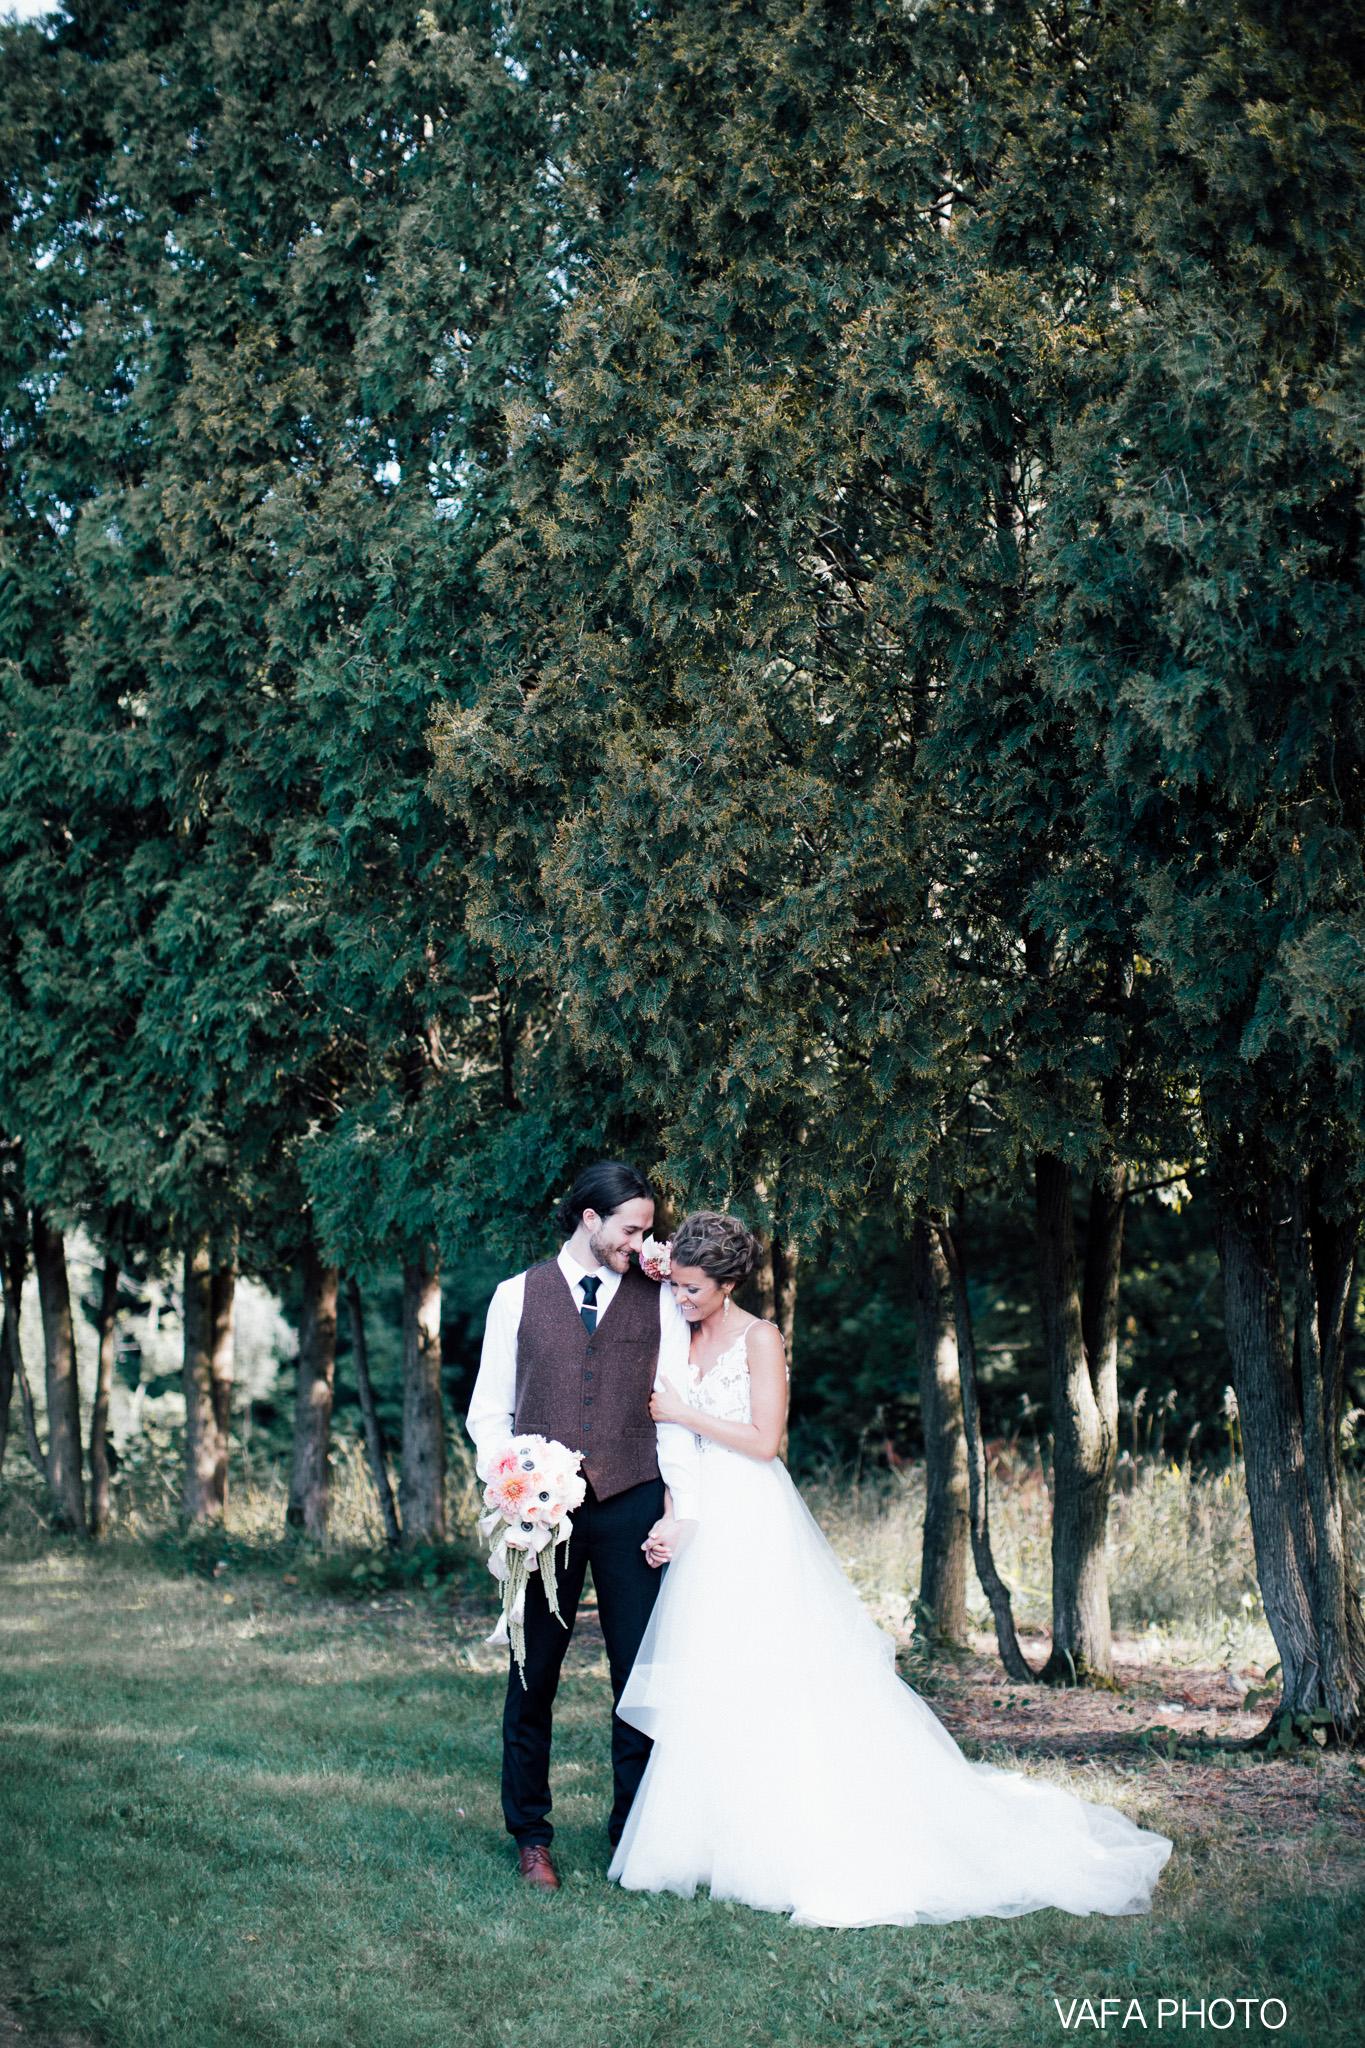 The-Felt-Estate-Wedding-Kailie-David-Vafa-Photo-660.jpg